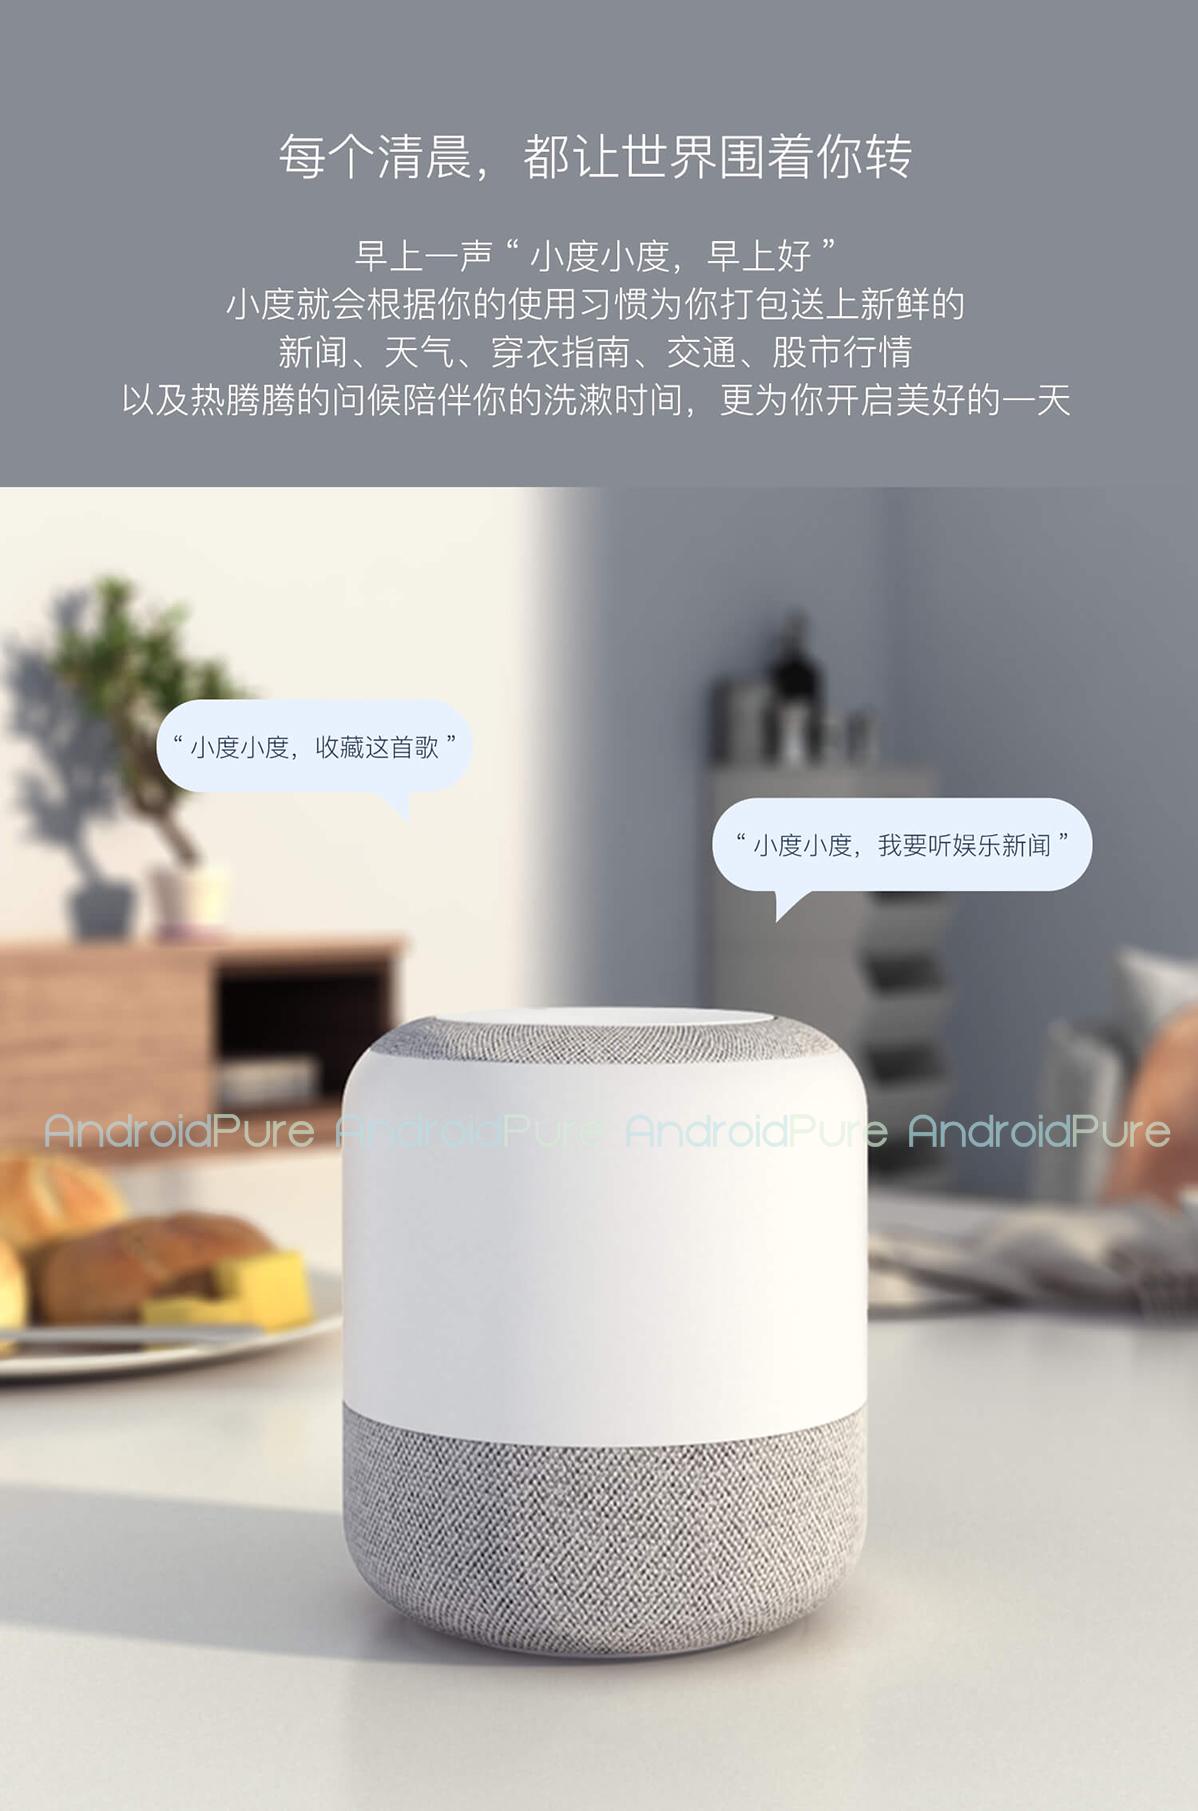 Moto AI Speakers Amazon Echo8 All about Motorola AI Assistant speakers, like Amazon Echo or Google Mini [Updated] 13